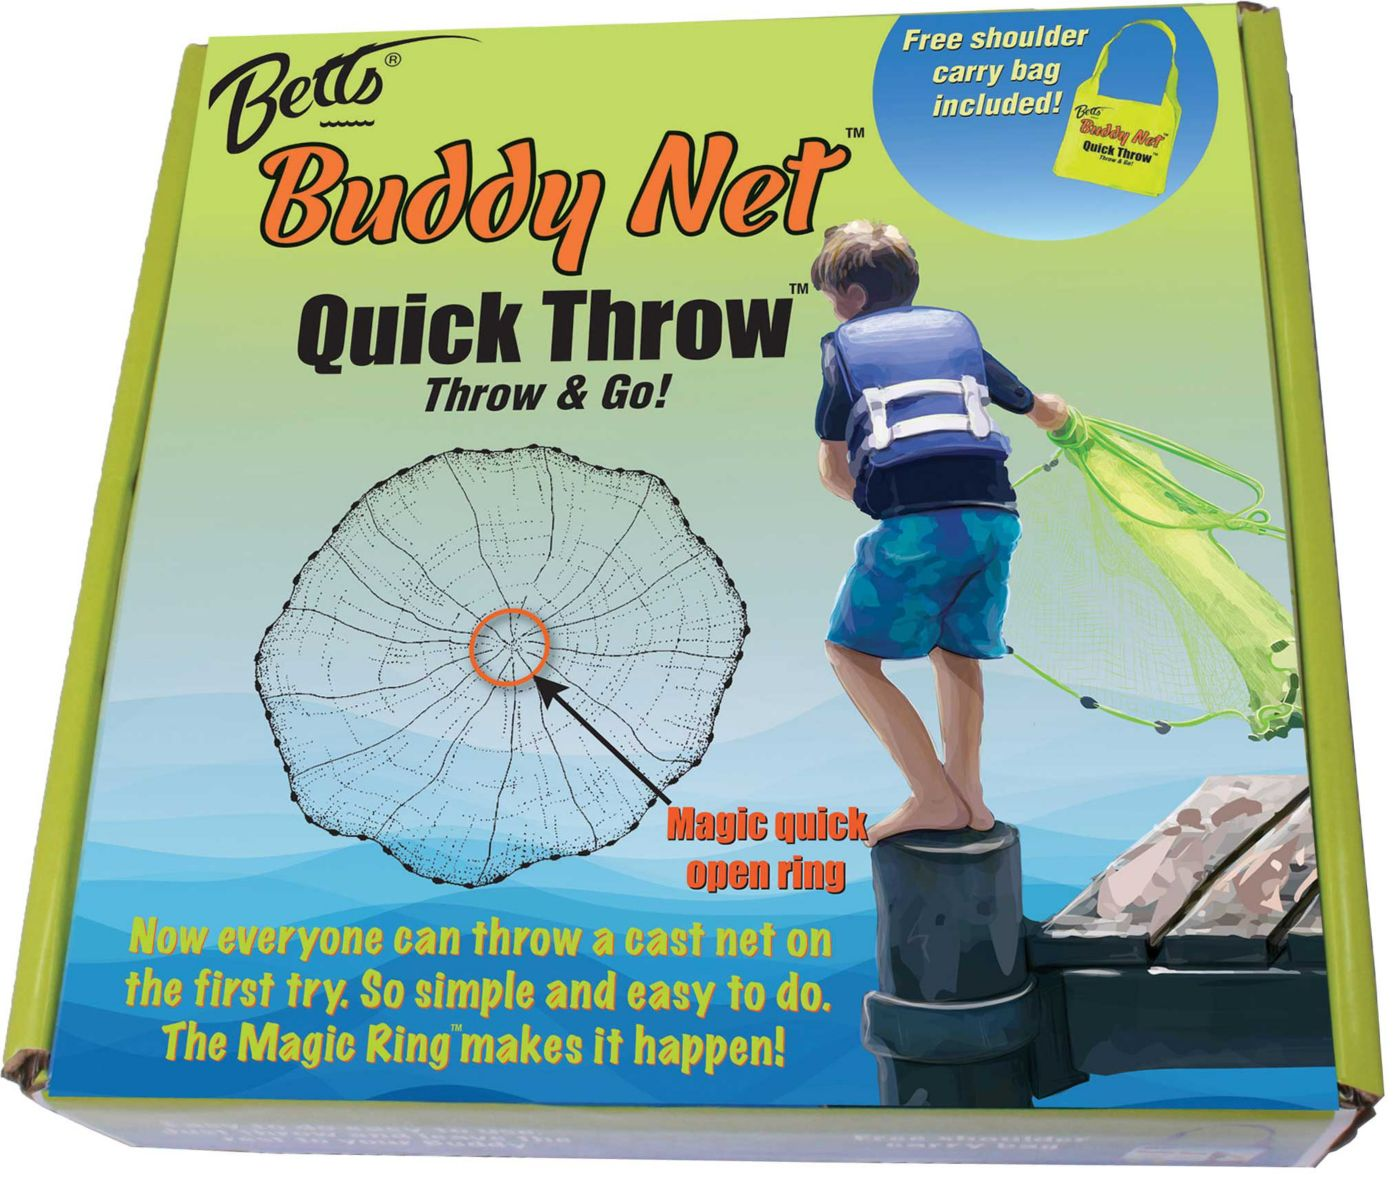 Betts Buddy Quick Throw Net